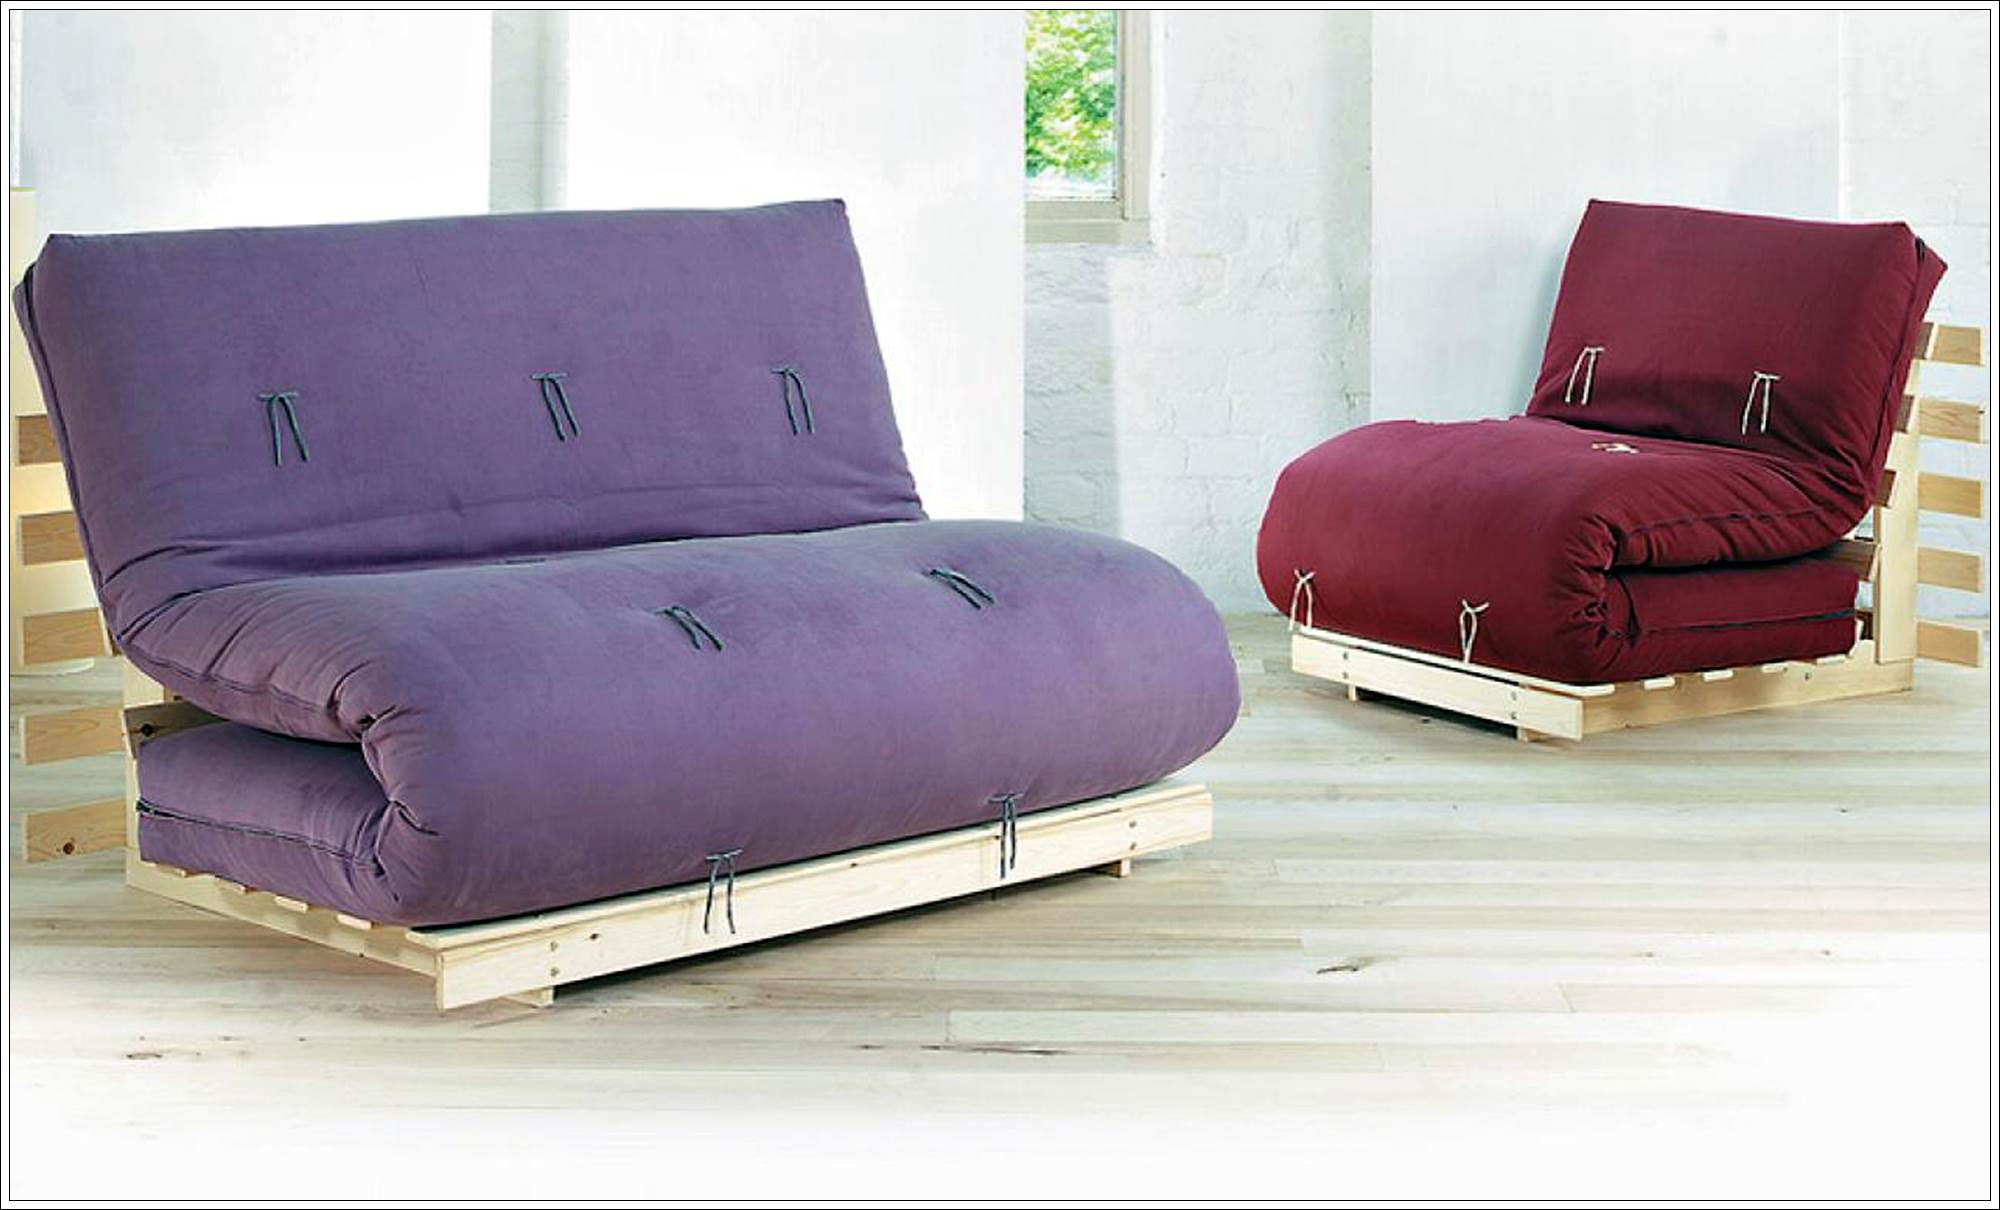 ikea jet de lit l gant image housse canap bz ikea interesting canape bz ikea canapac alacgant. Black Bedroom Furniture Sets. Home Design Ideas